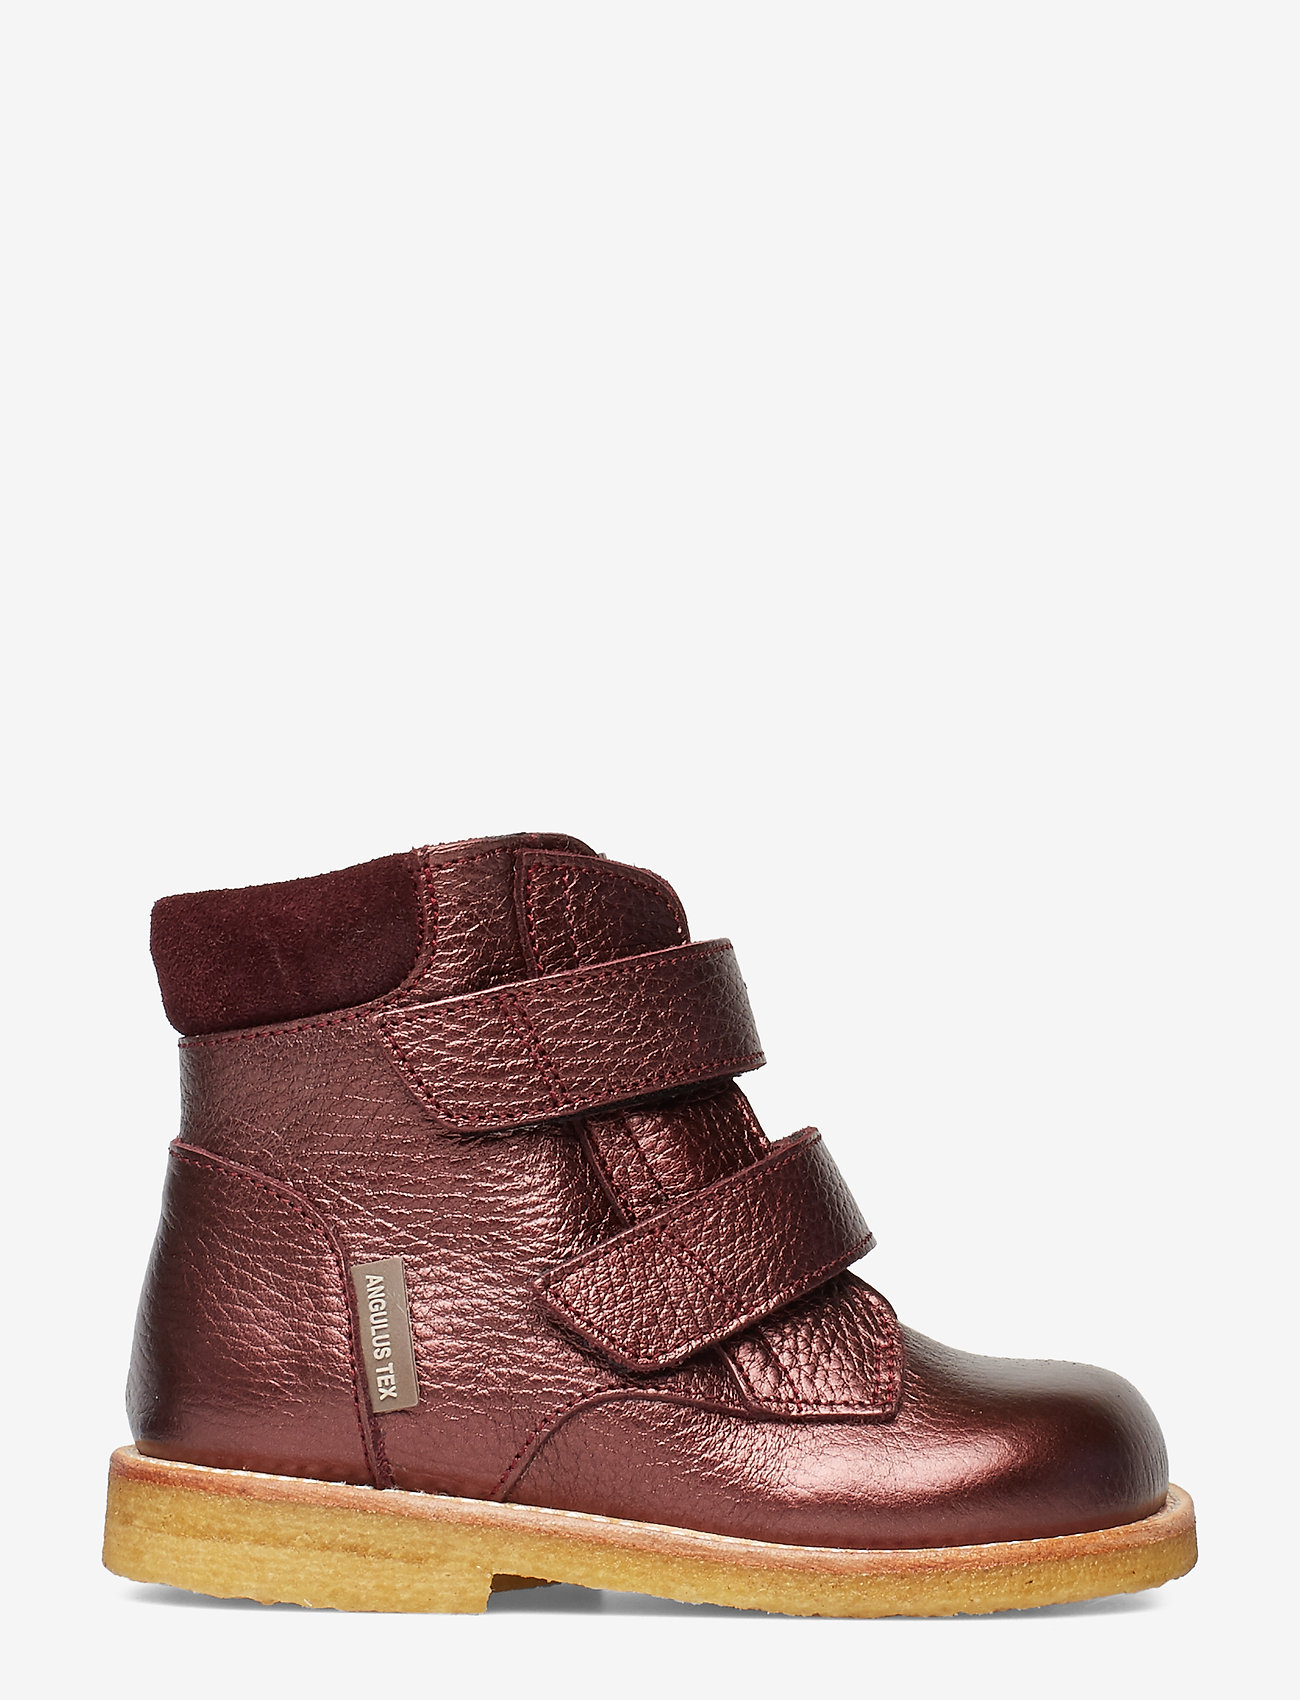 ANGULUS - Boots - flat - with velcro - lauflernschuhe - 1536/2195 bordeaux shine/b - 1